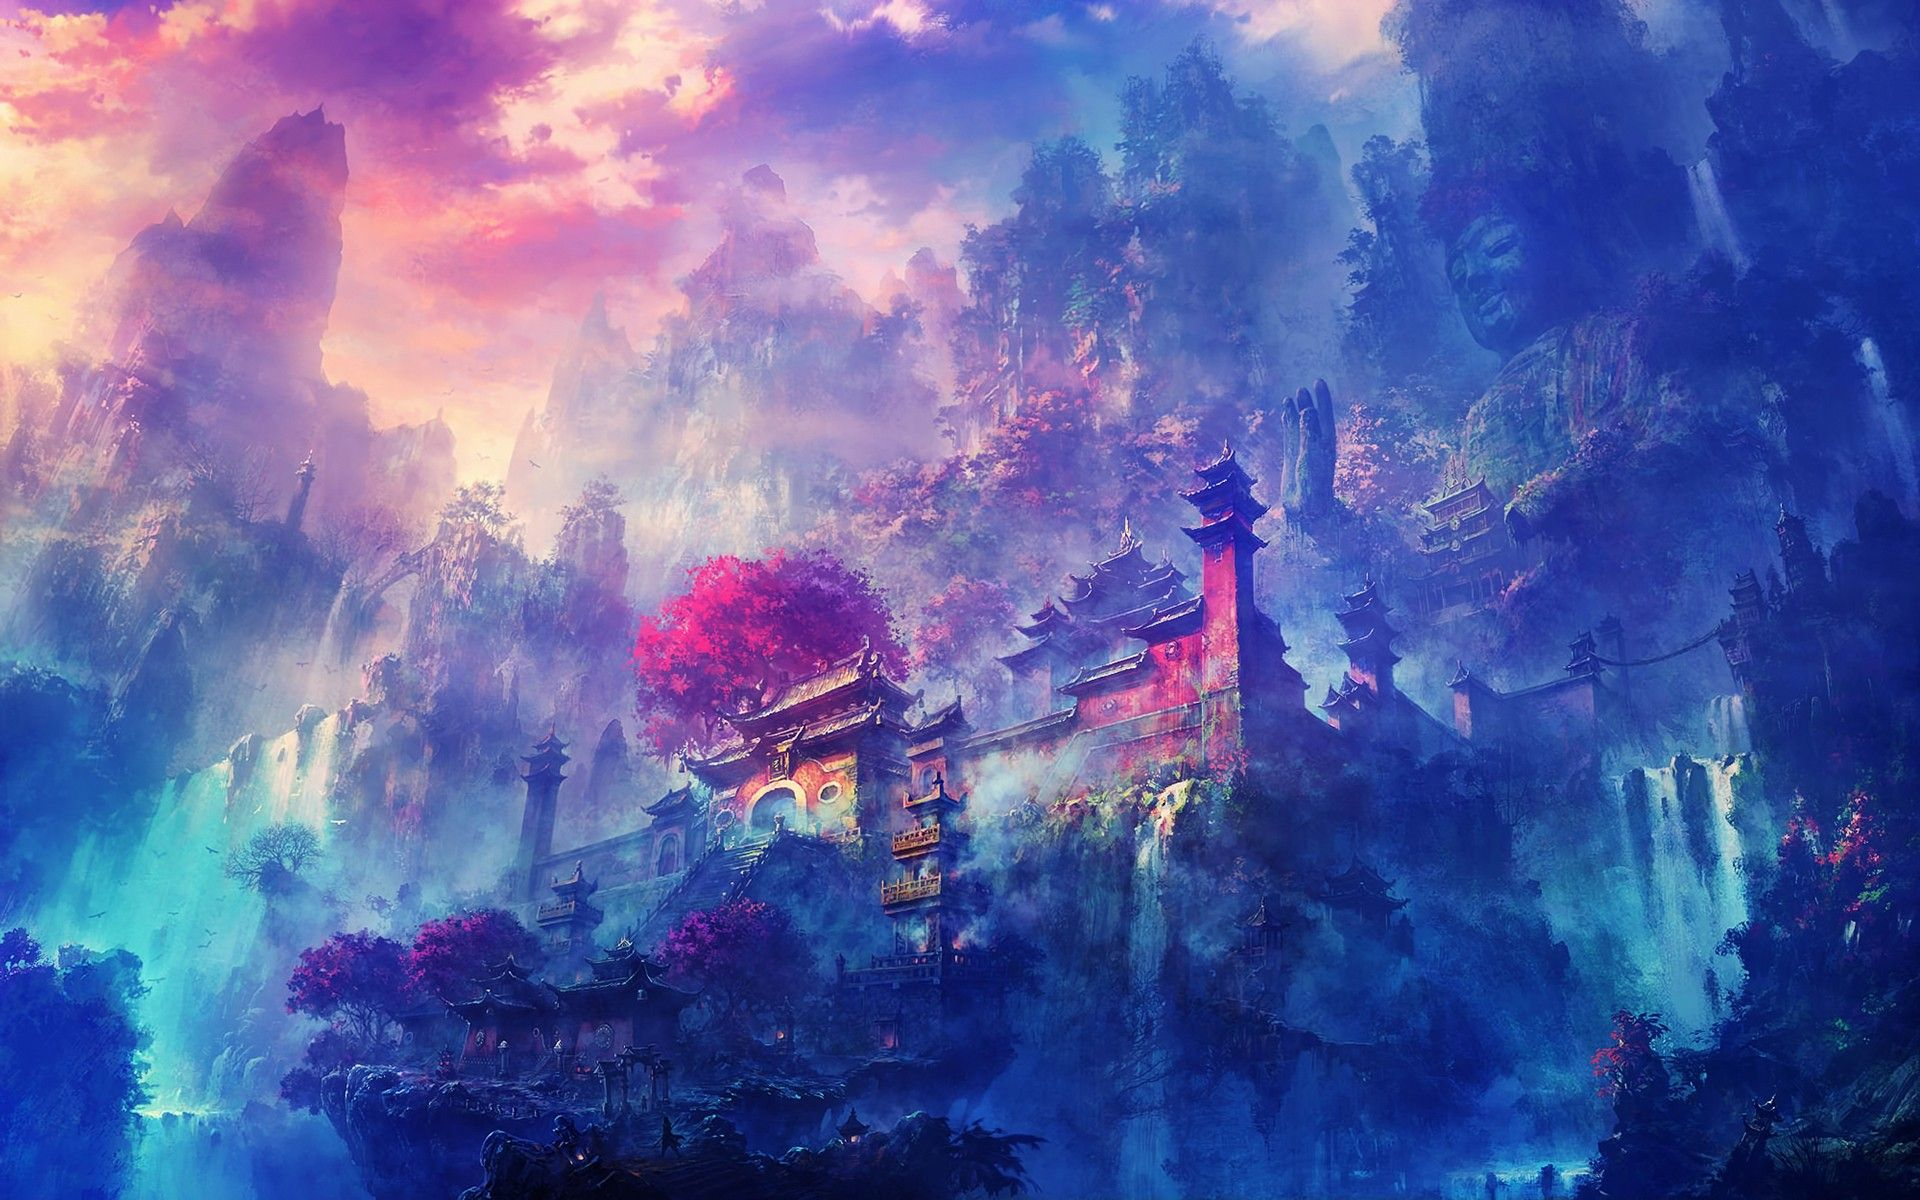 The Empire Anime Scenery Wallpaper Anime Scenery Art Wallpaper